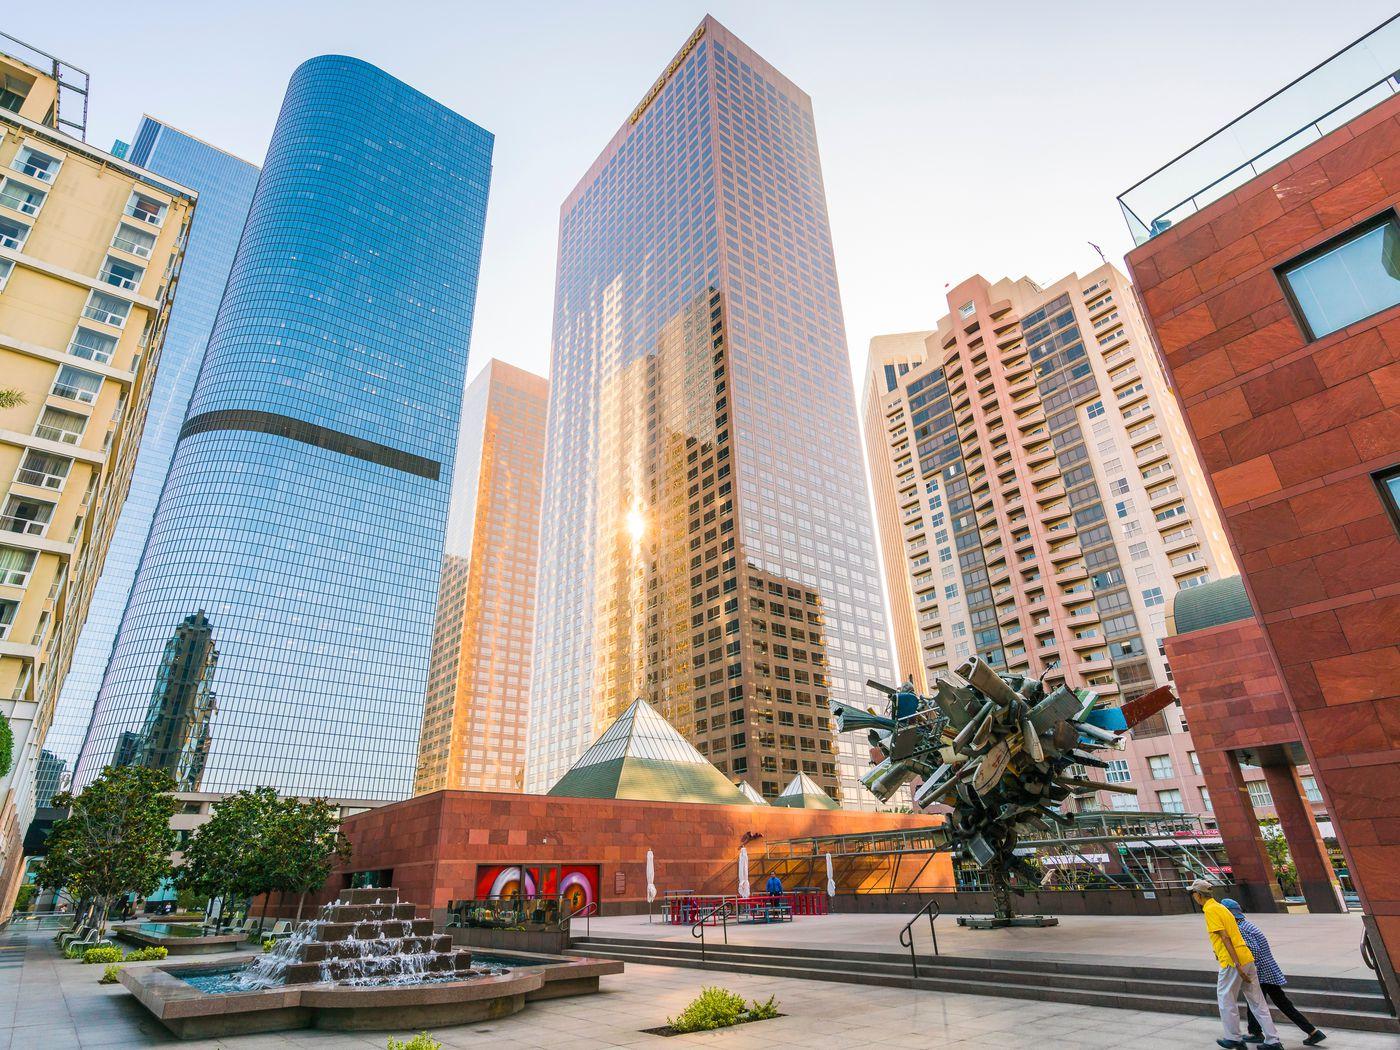 Los Angeles New Modern Art Museum